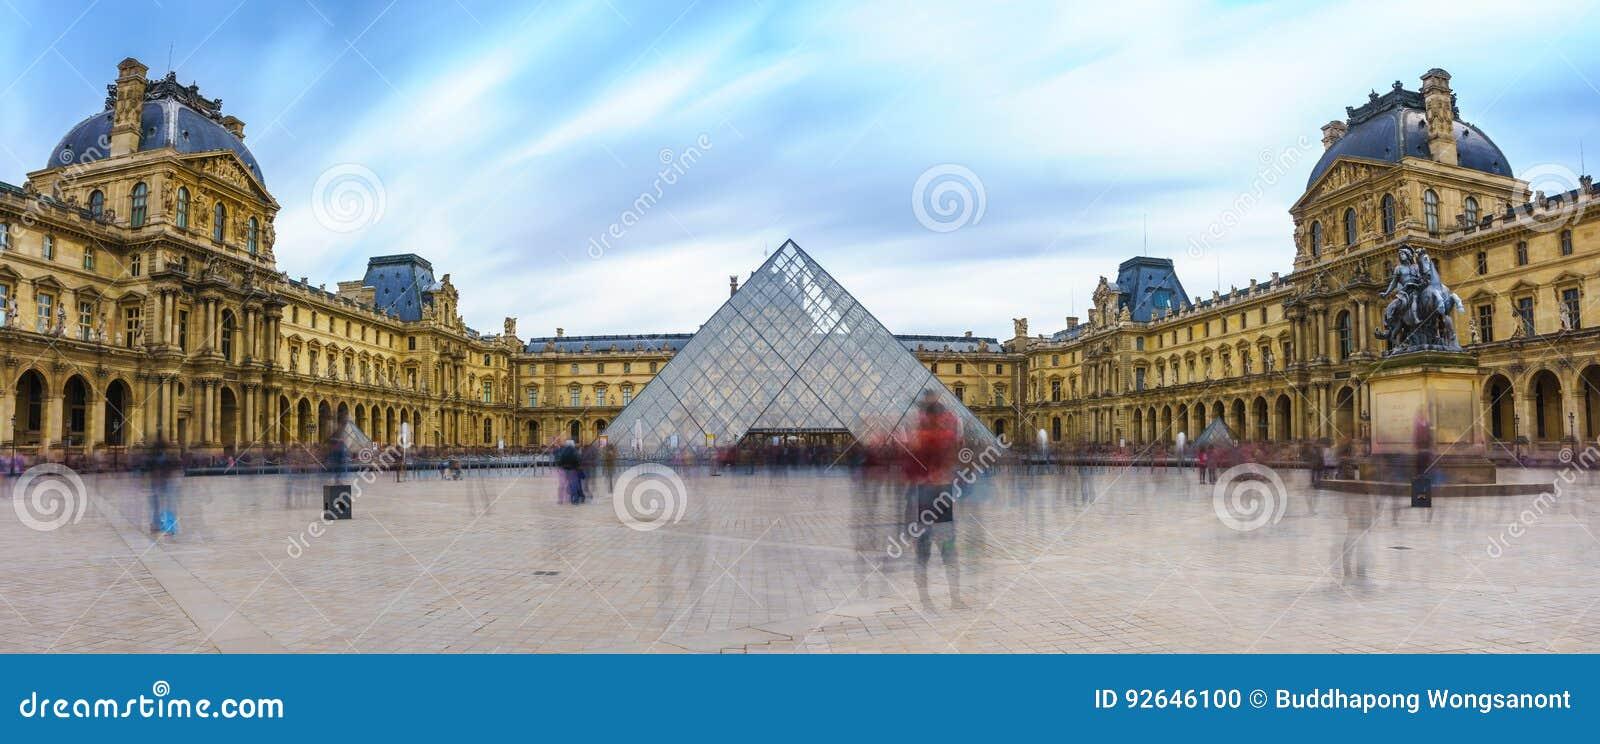 Париж, Франция - 1-ое мая 2017: Панорамный взгляд Лувра